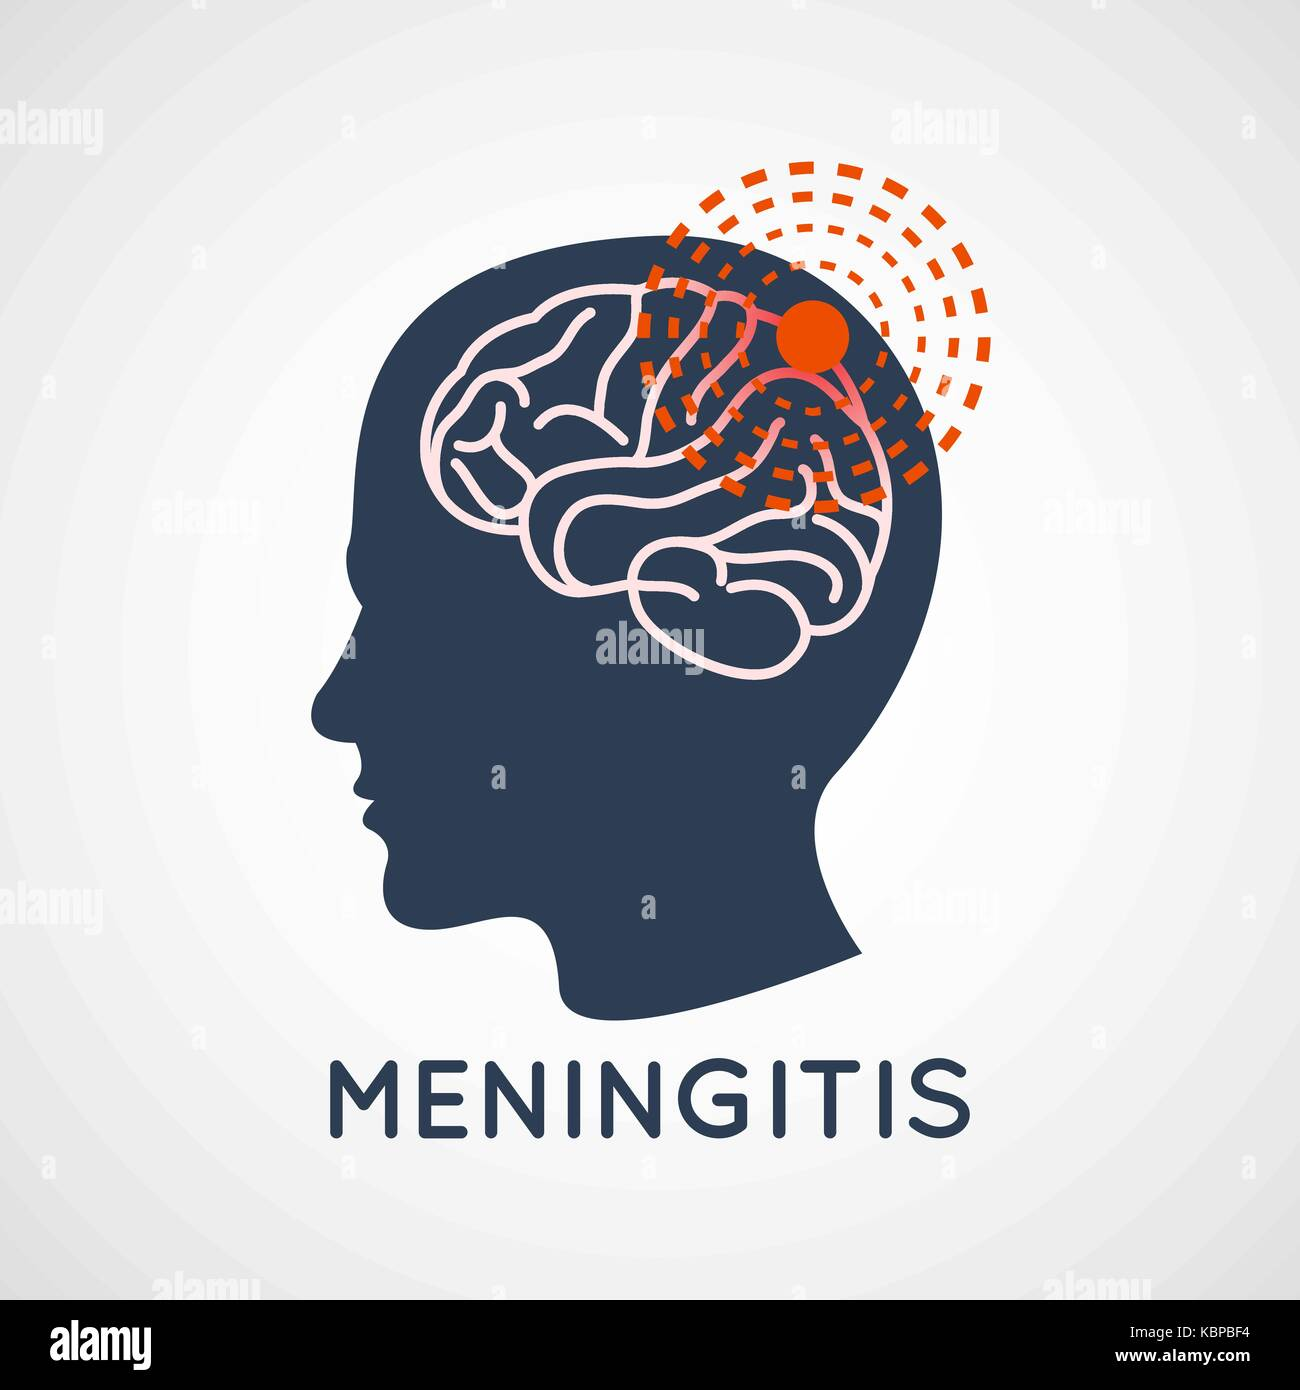 MENINGITIS logo vector icon design illustration - Stock Image